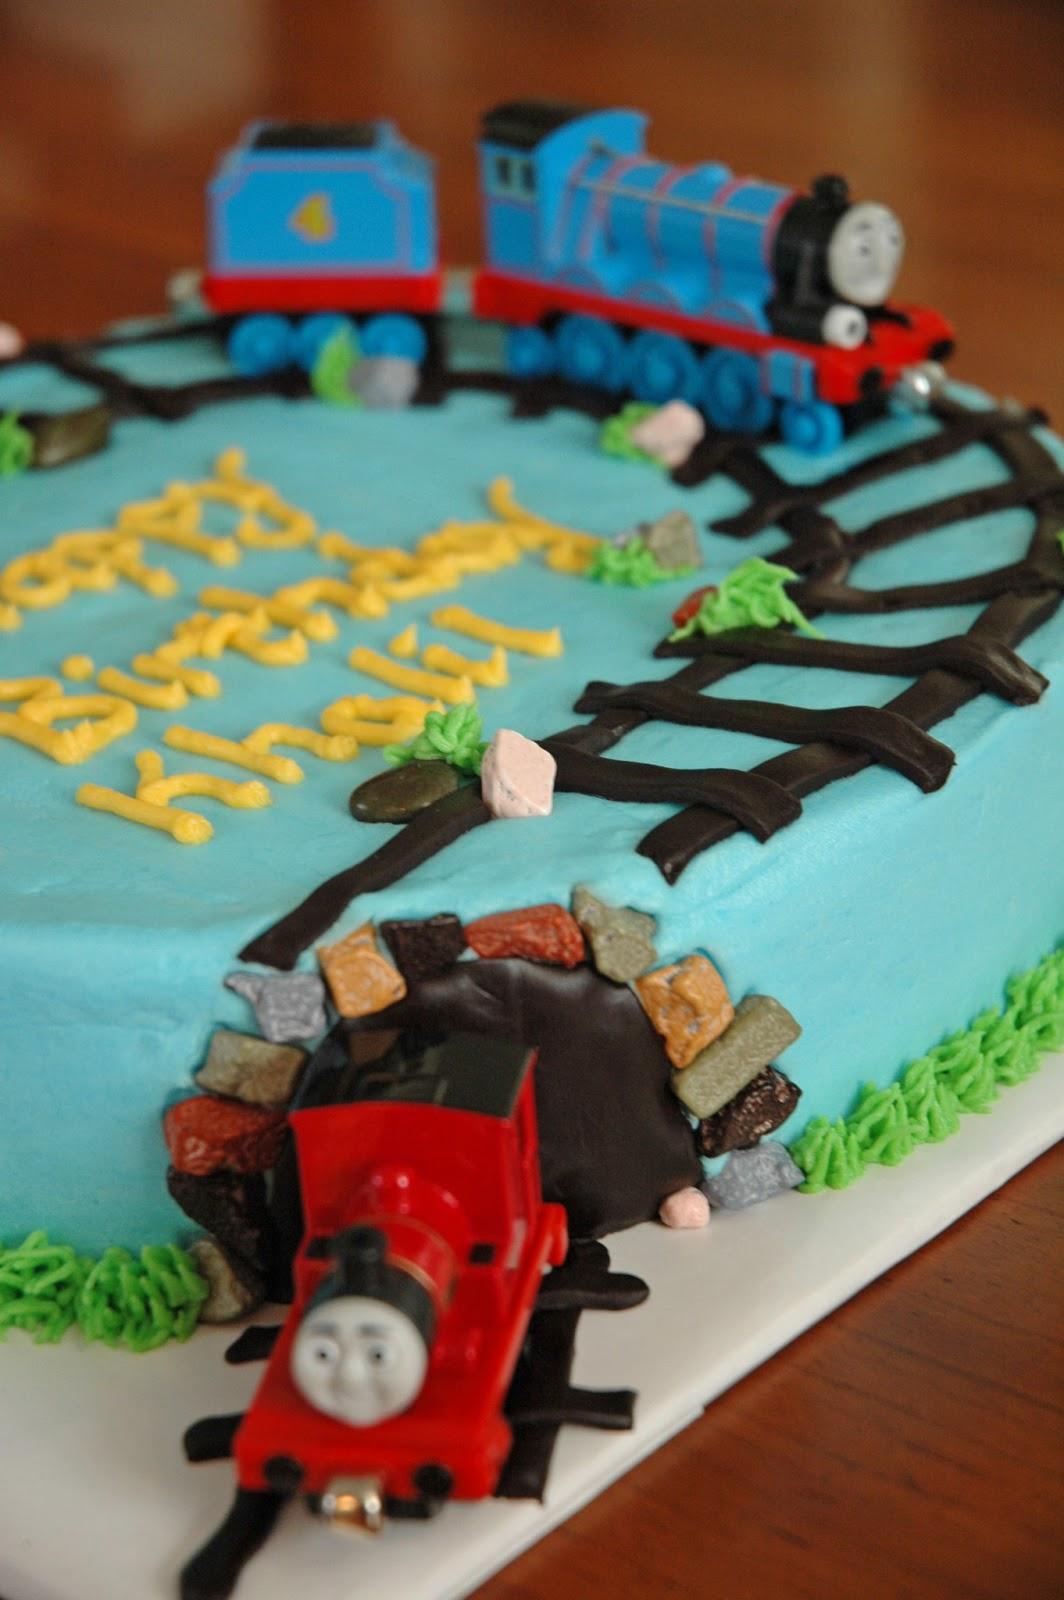 Cash S Cakes Thomas The Train Cake Choo Chooo